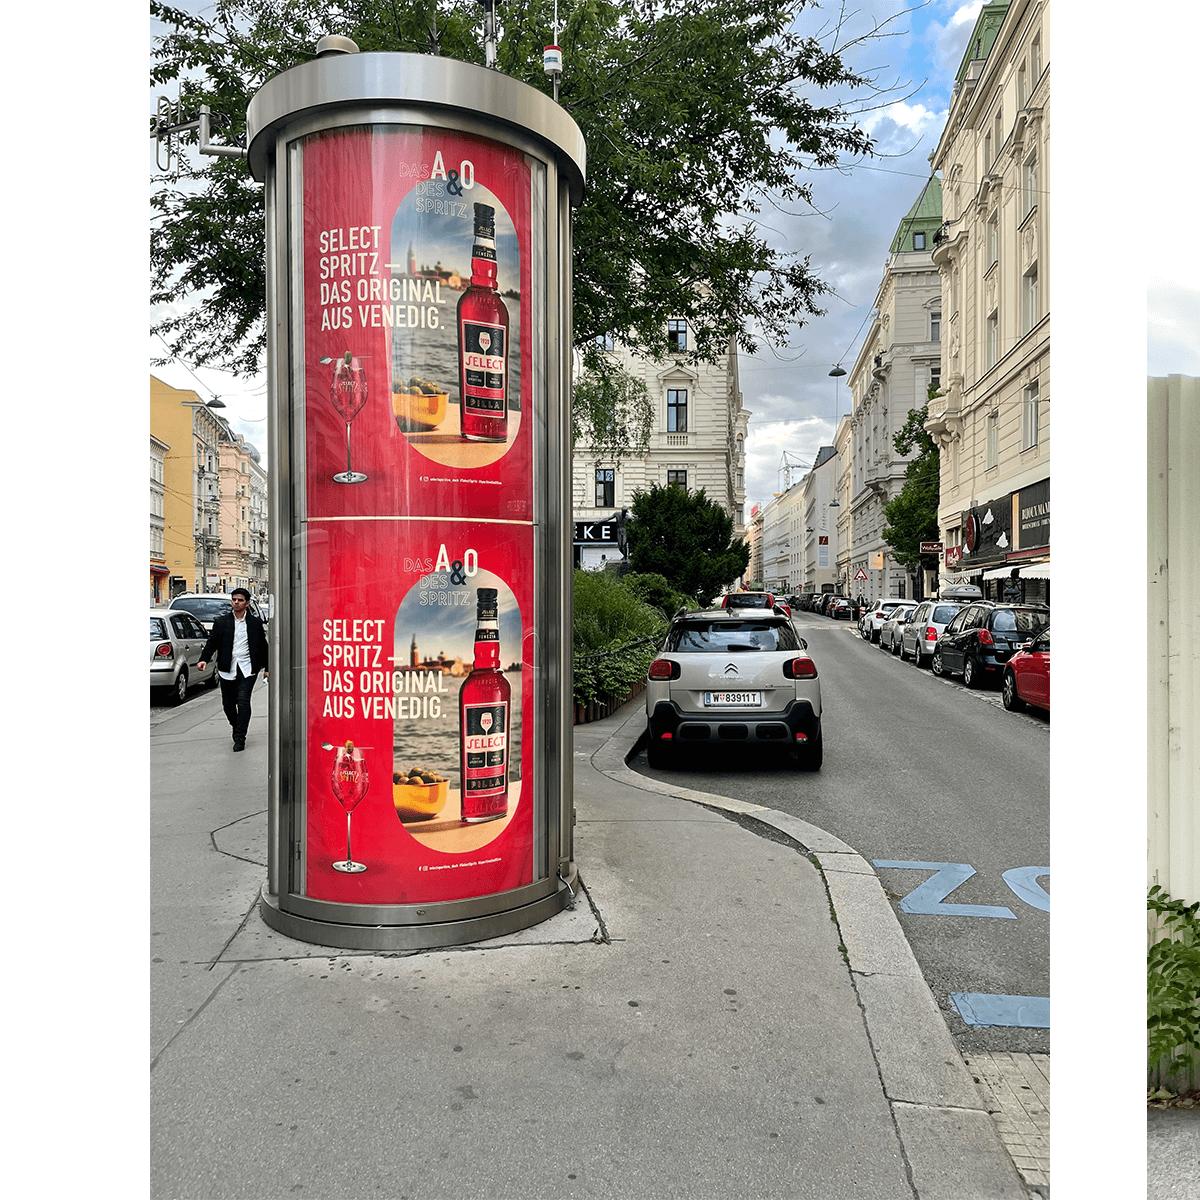 GK_PB_SEL-Kampagne-Carousel-2